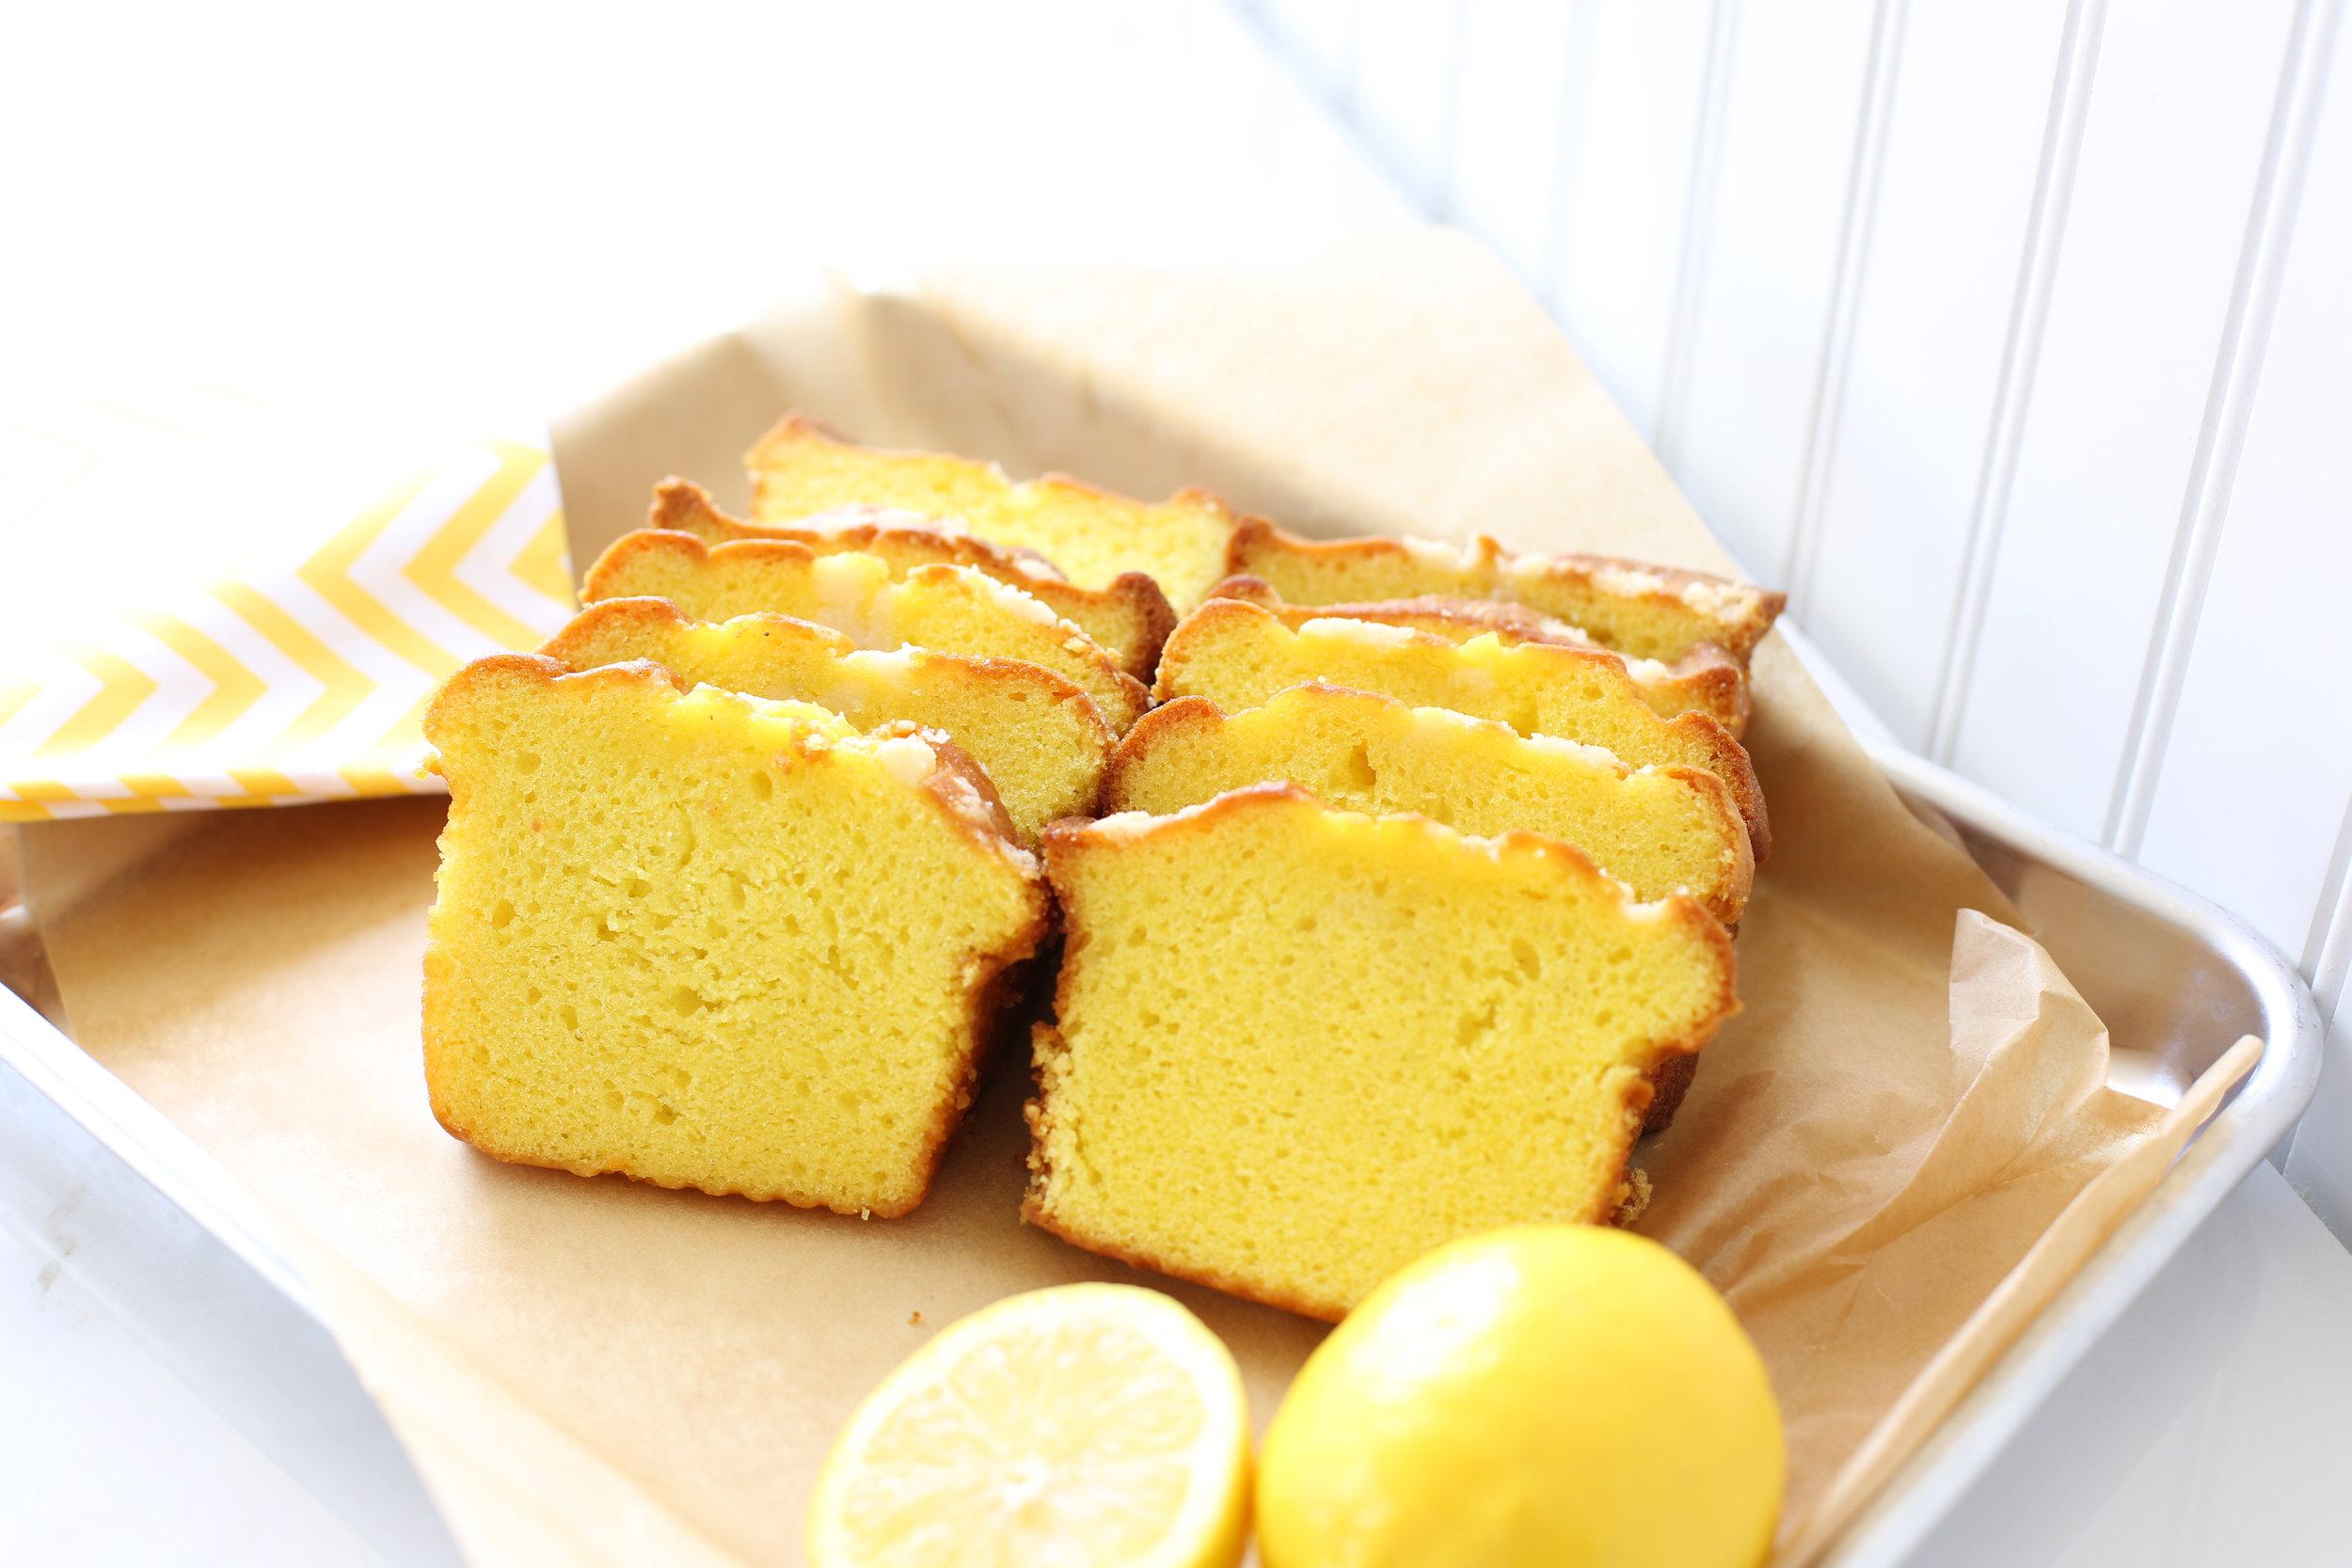 Mrs. Wonderful's Cakes™ - Lemon Sliced Loaf Cake